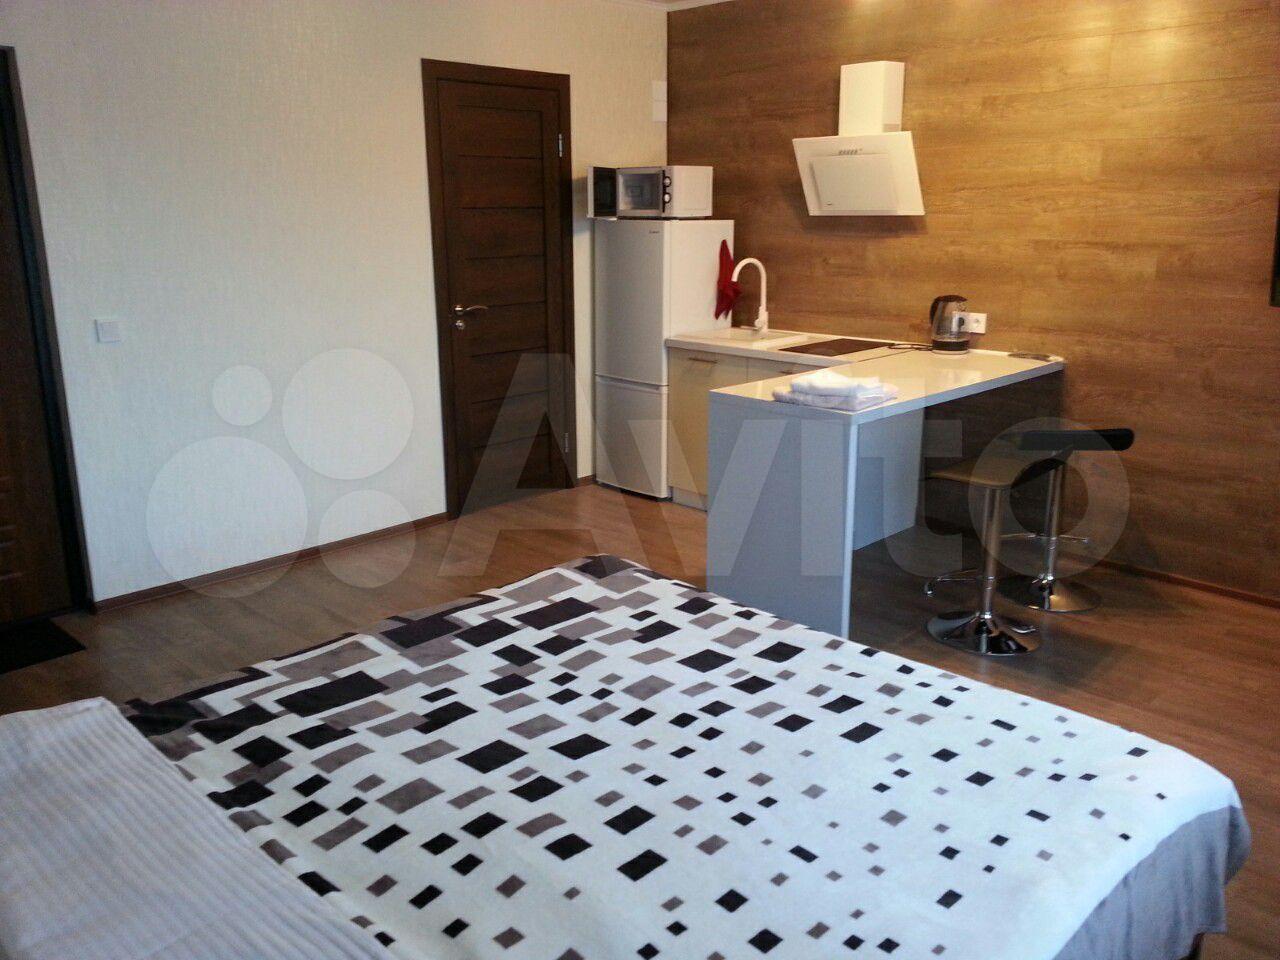 Квартира-студия, 23 м², 3/4 эт.